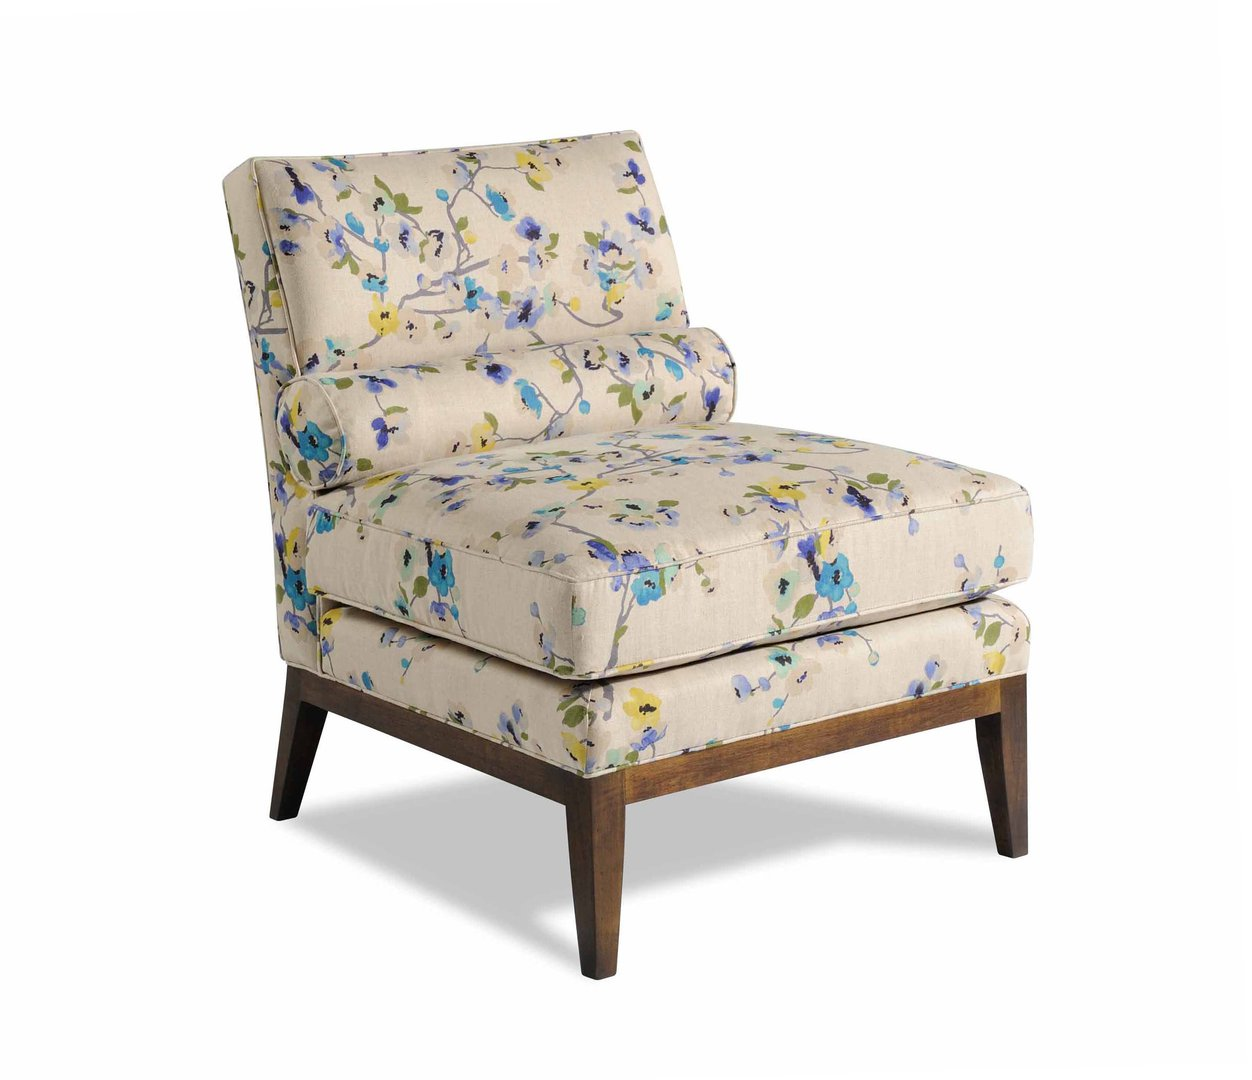 Springer Chair Image